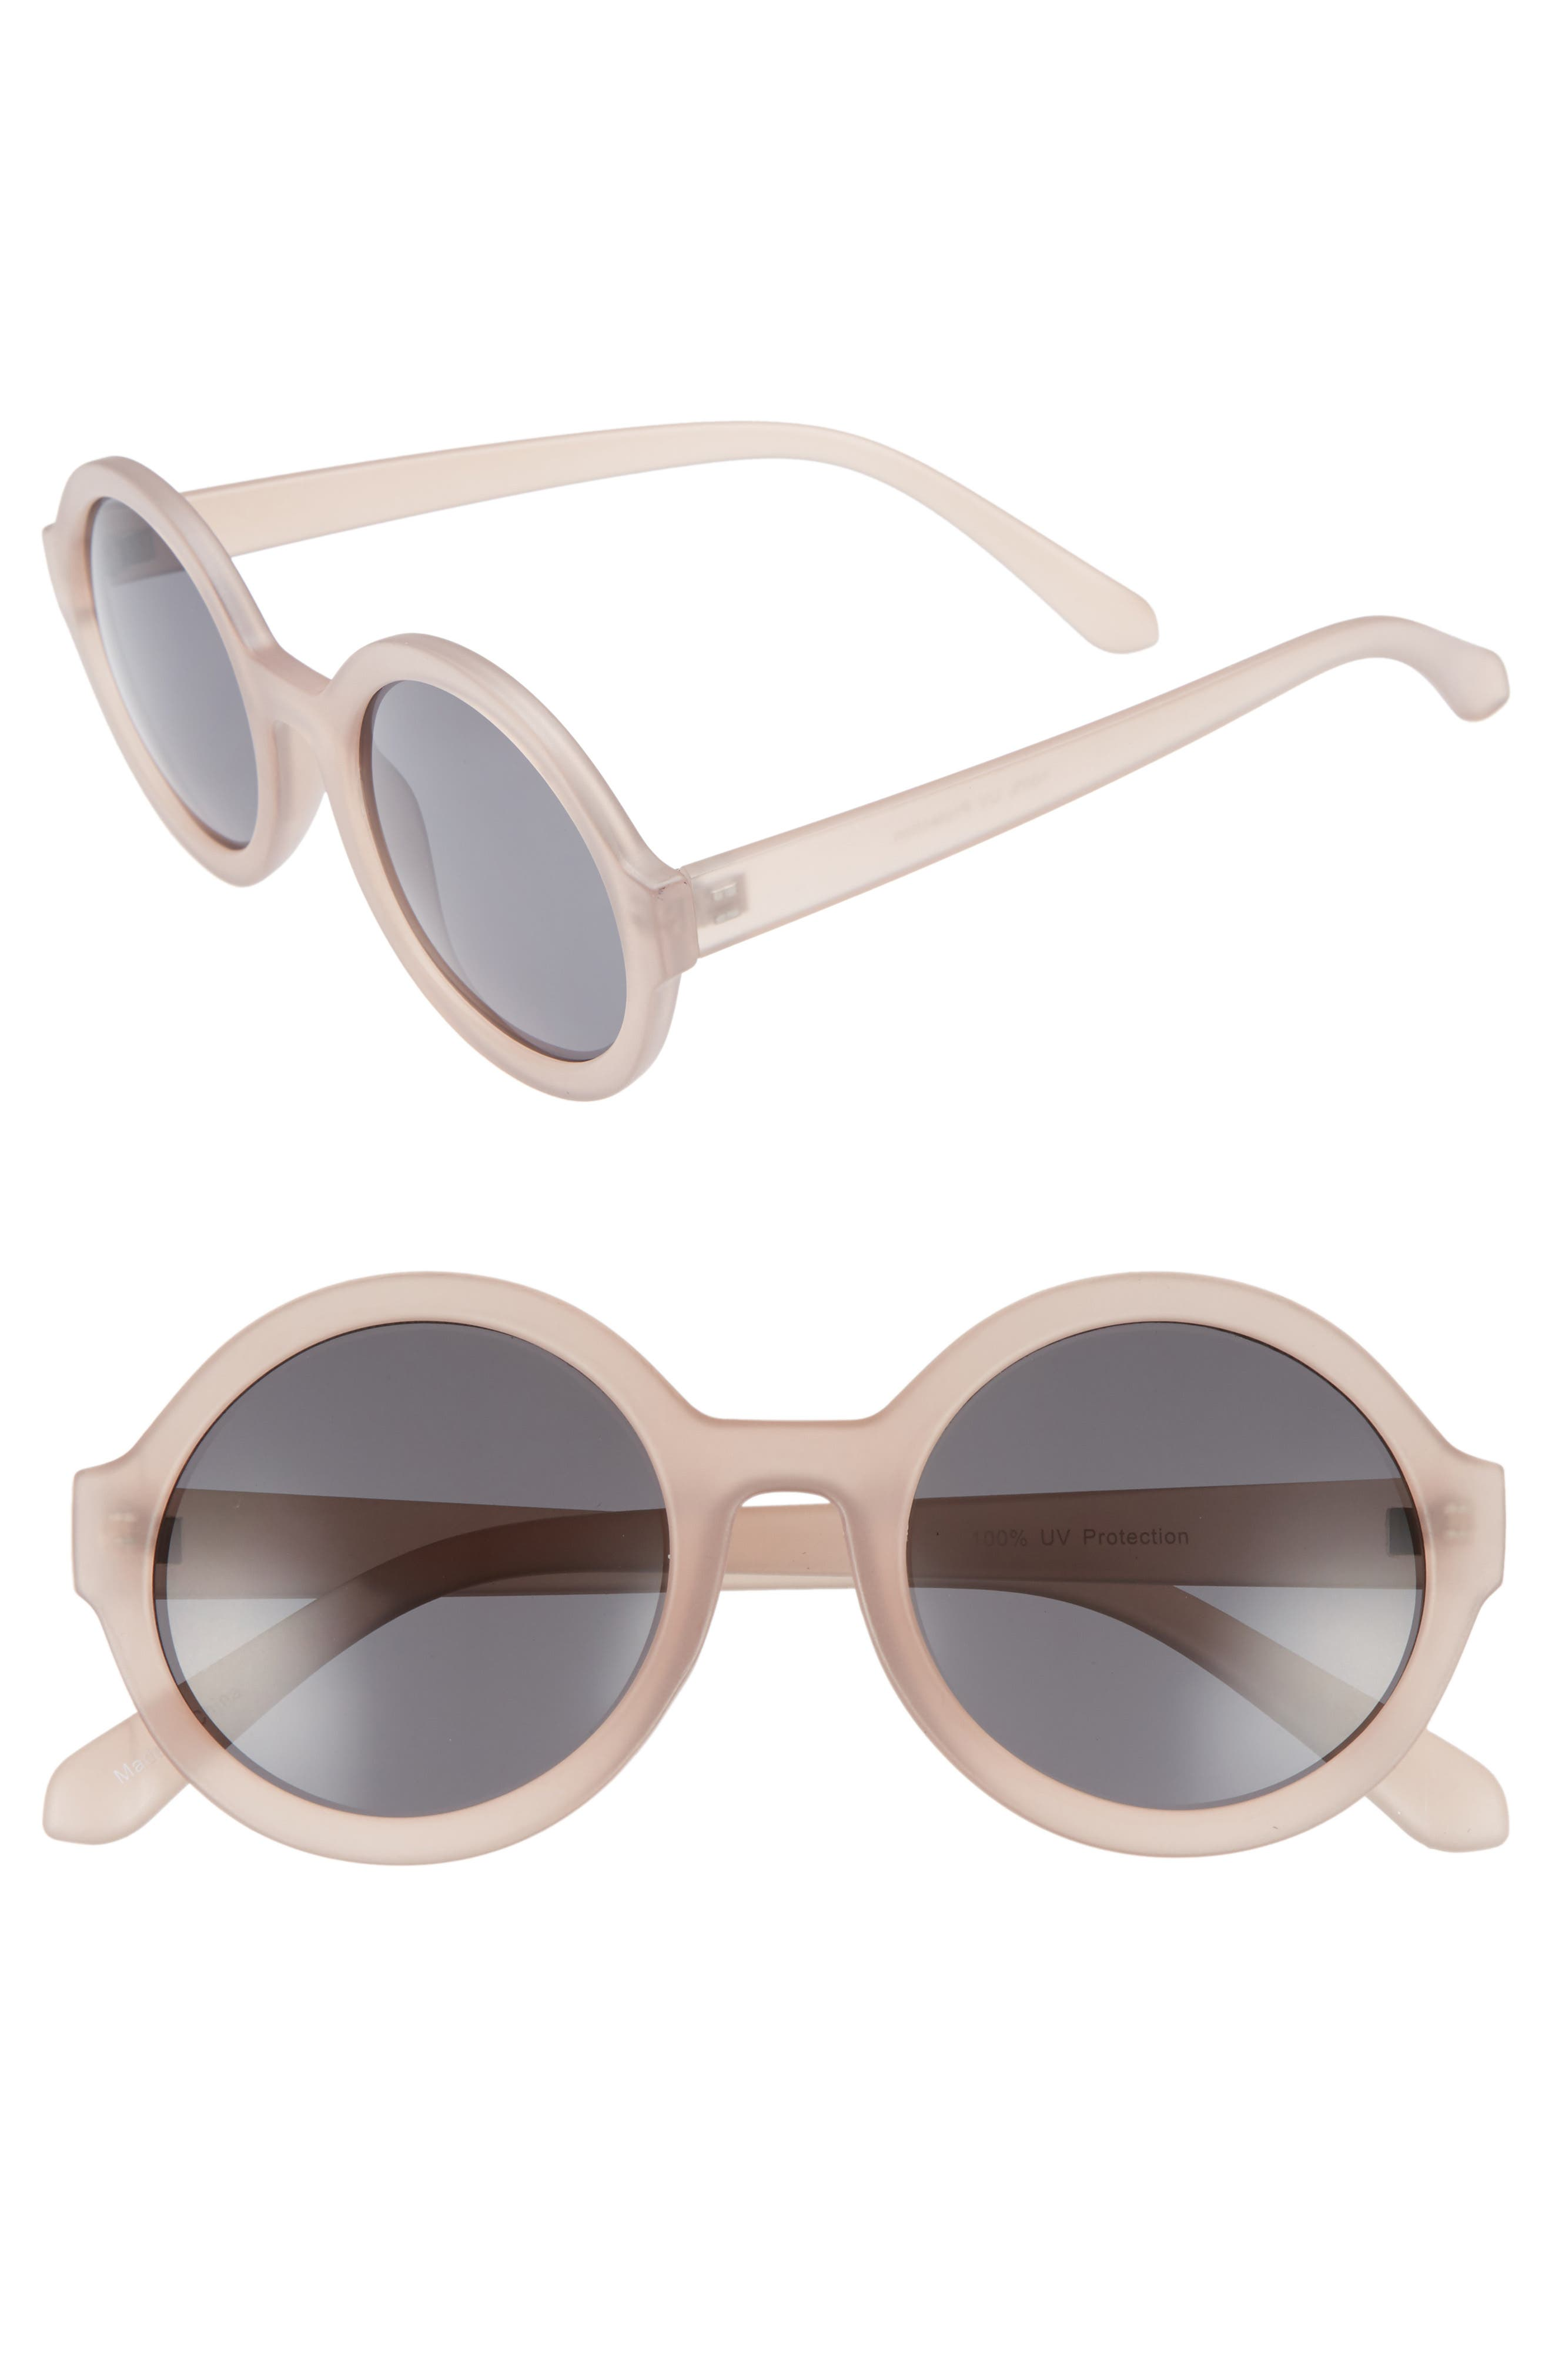 50mm Round Sunglasses,                             Main thumbnail 1, color,                             650